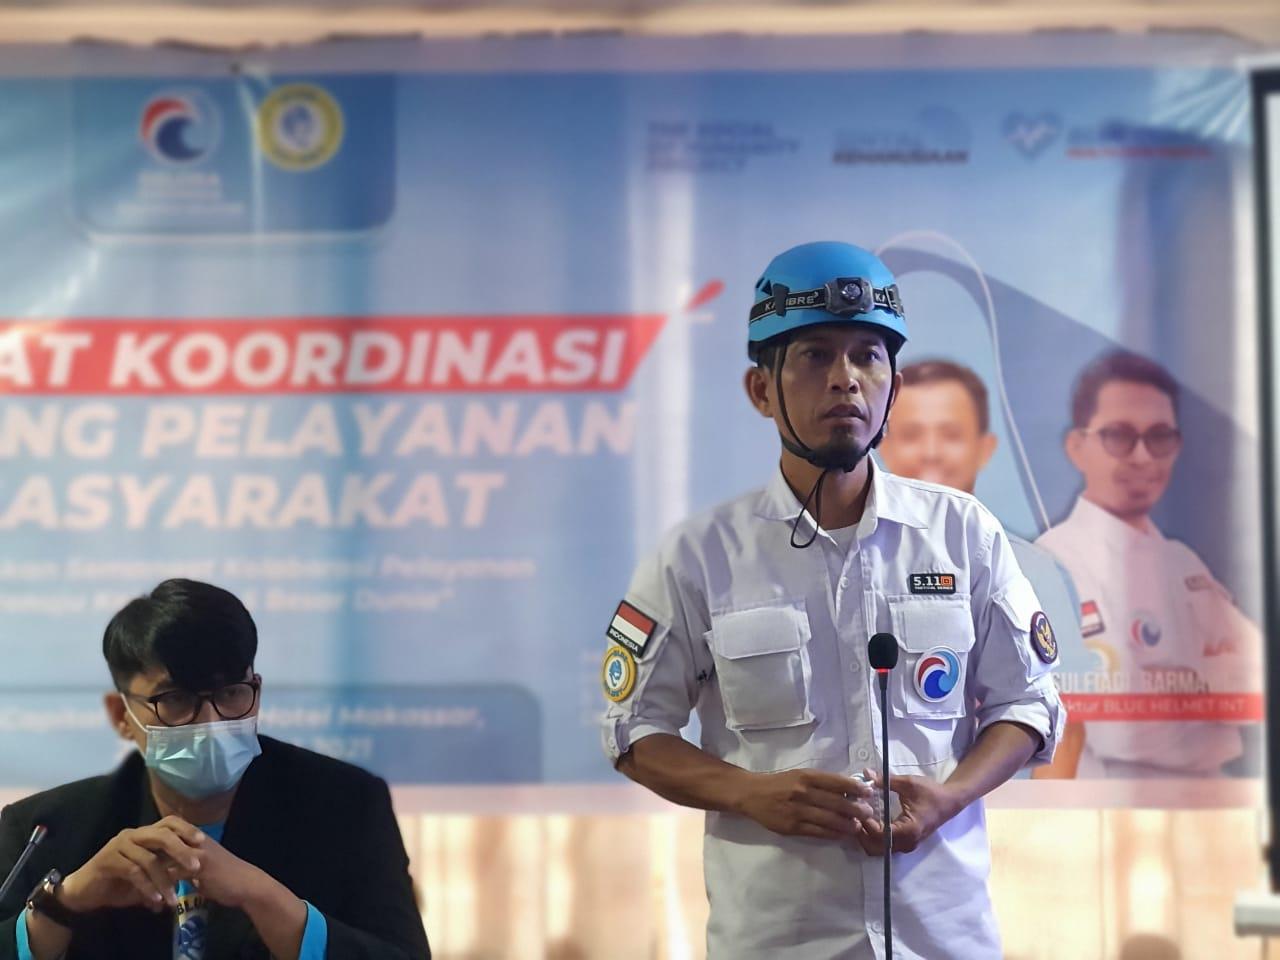 Ketua Umum Blue Helmet, Sulfiadi Barmawi: Tim Kami Sudah Tiba di NTT